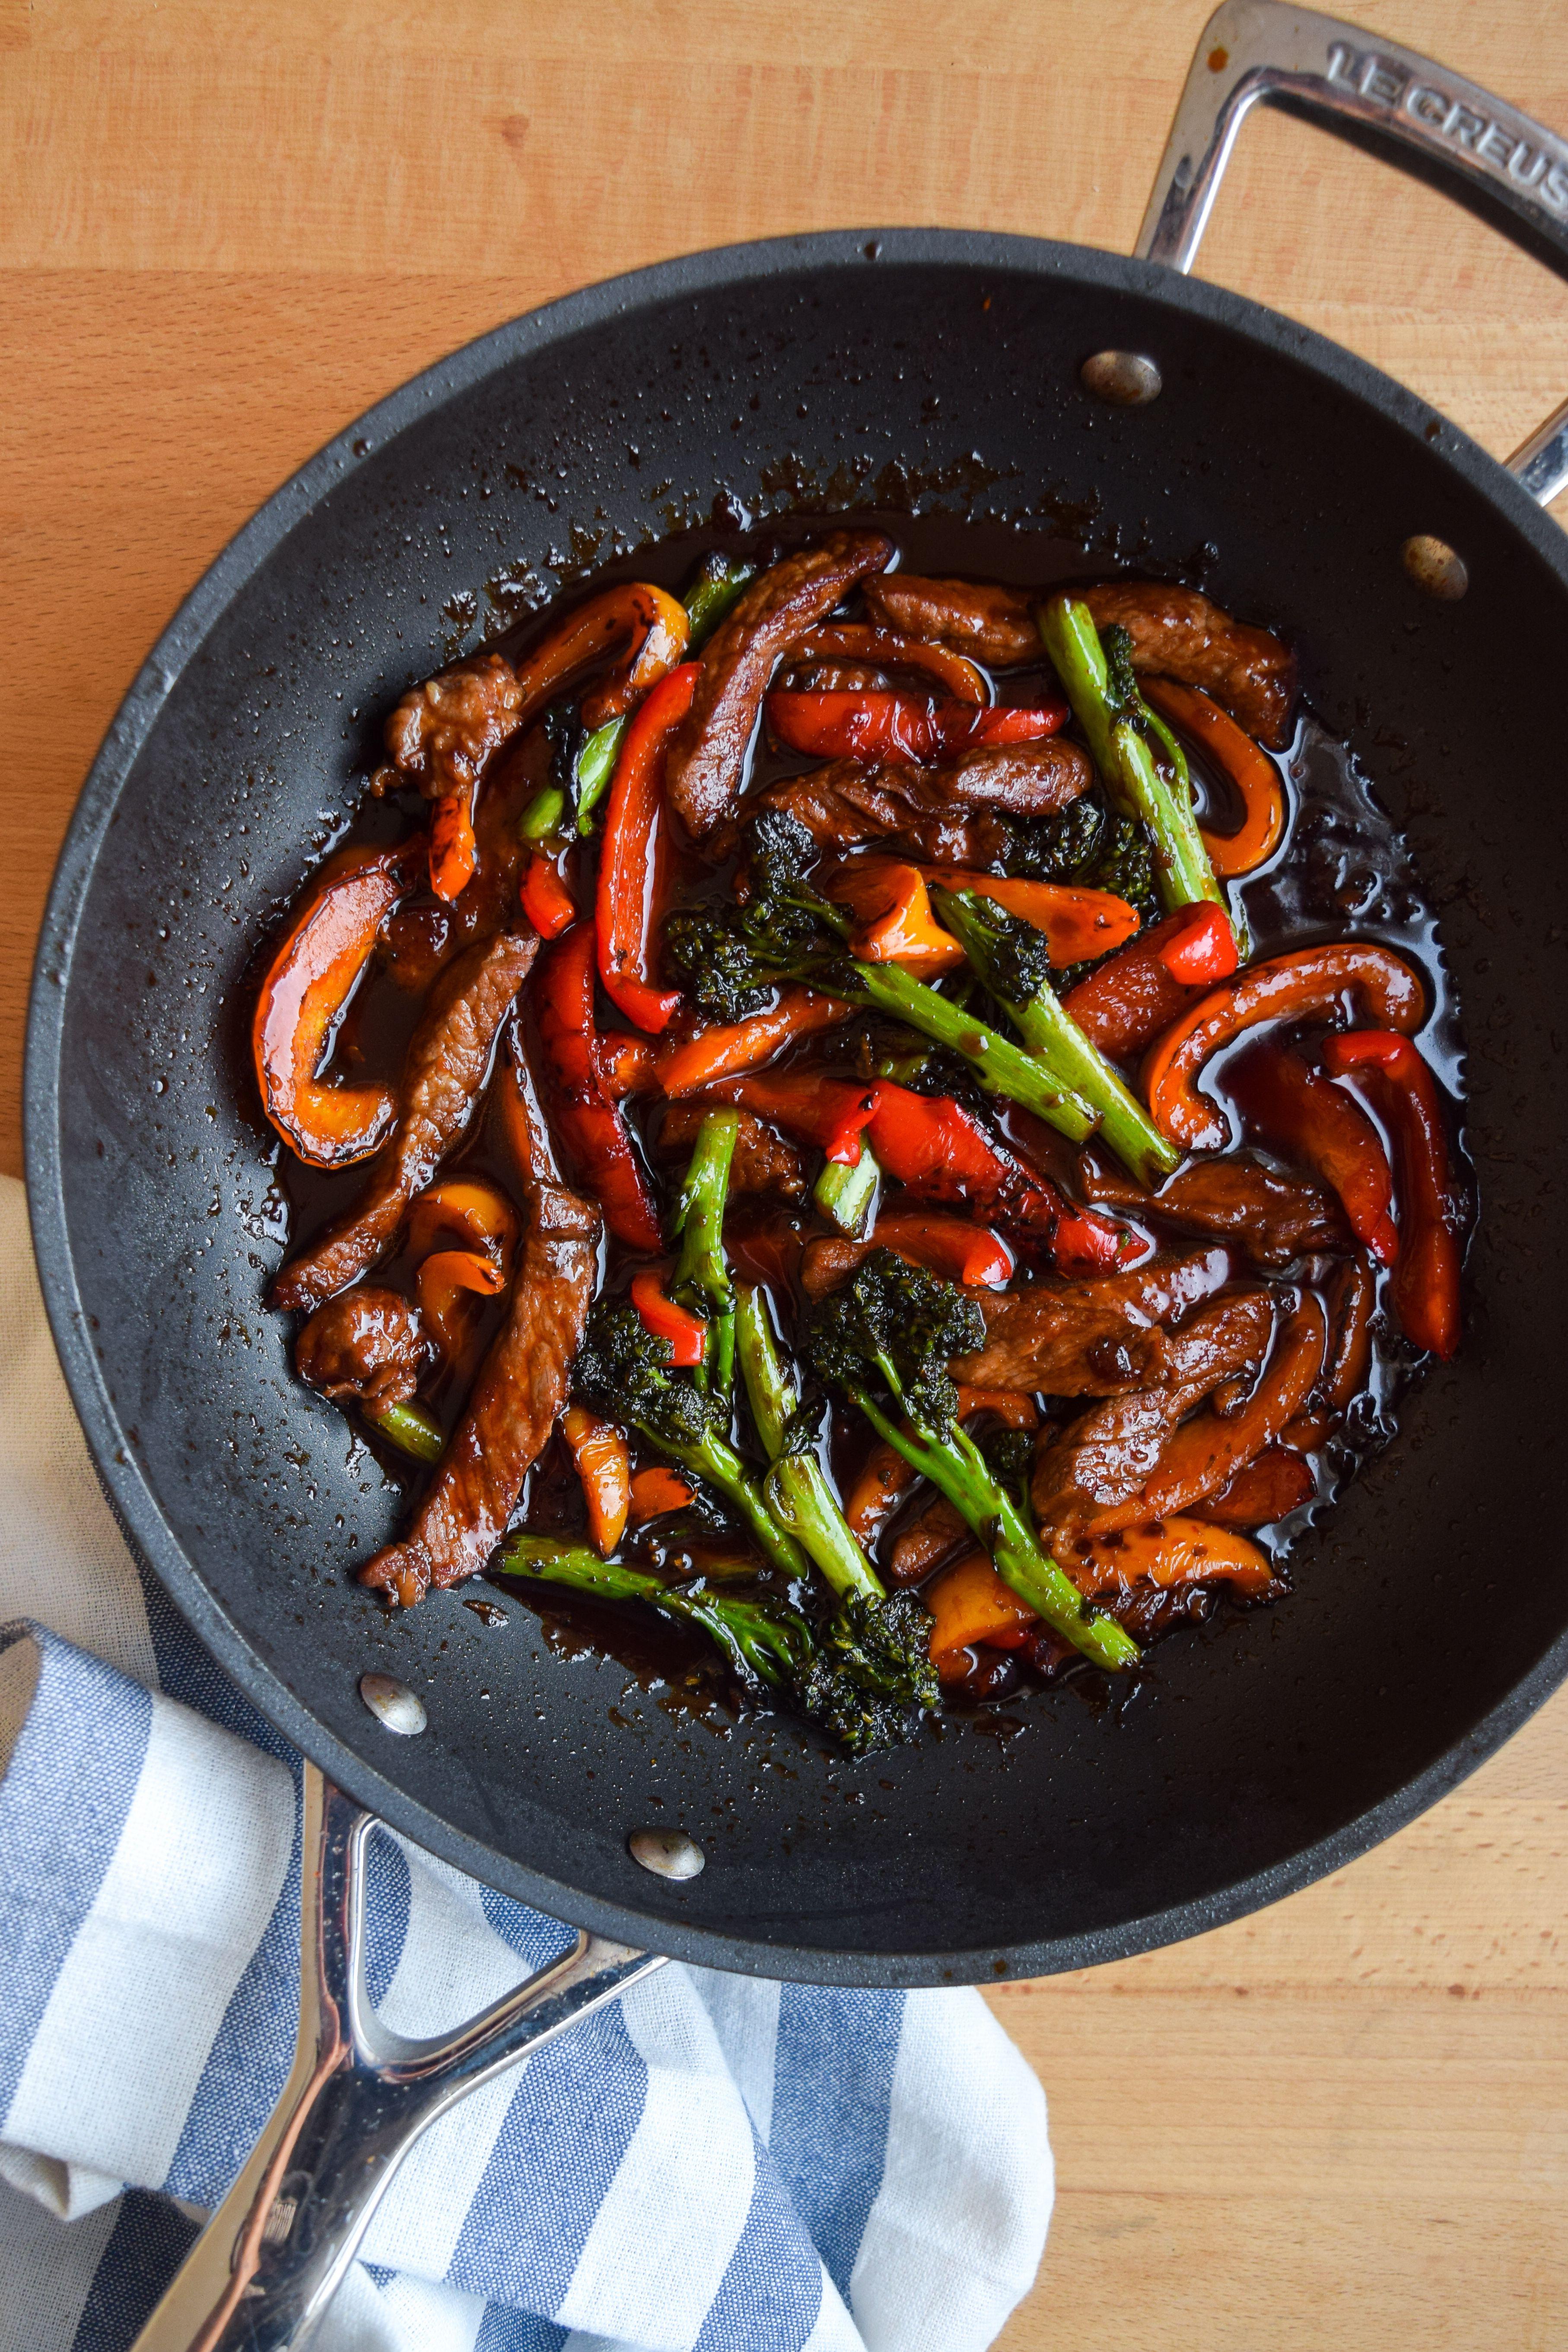 Spicy Korean Steak Pepper and Broccoli